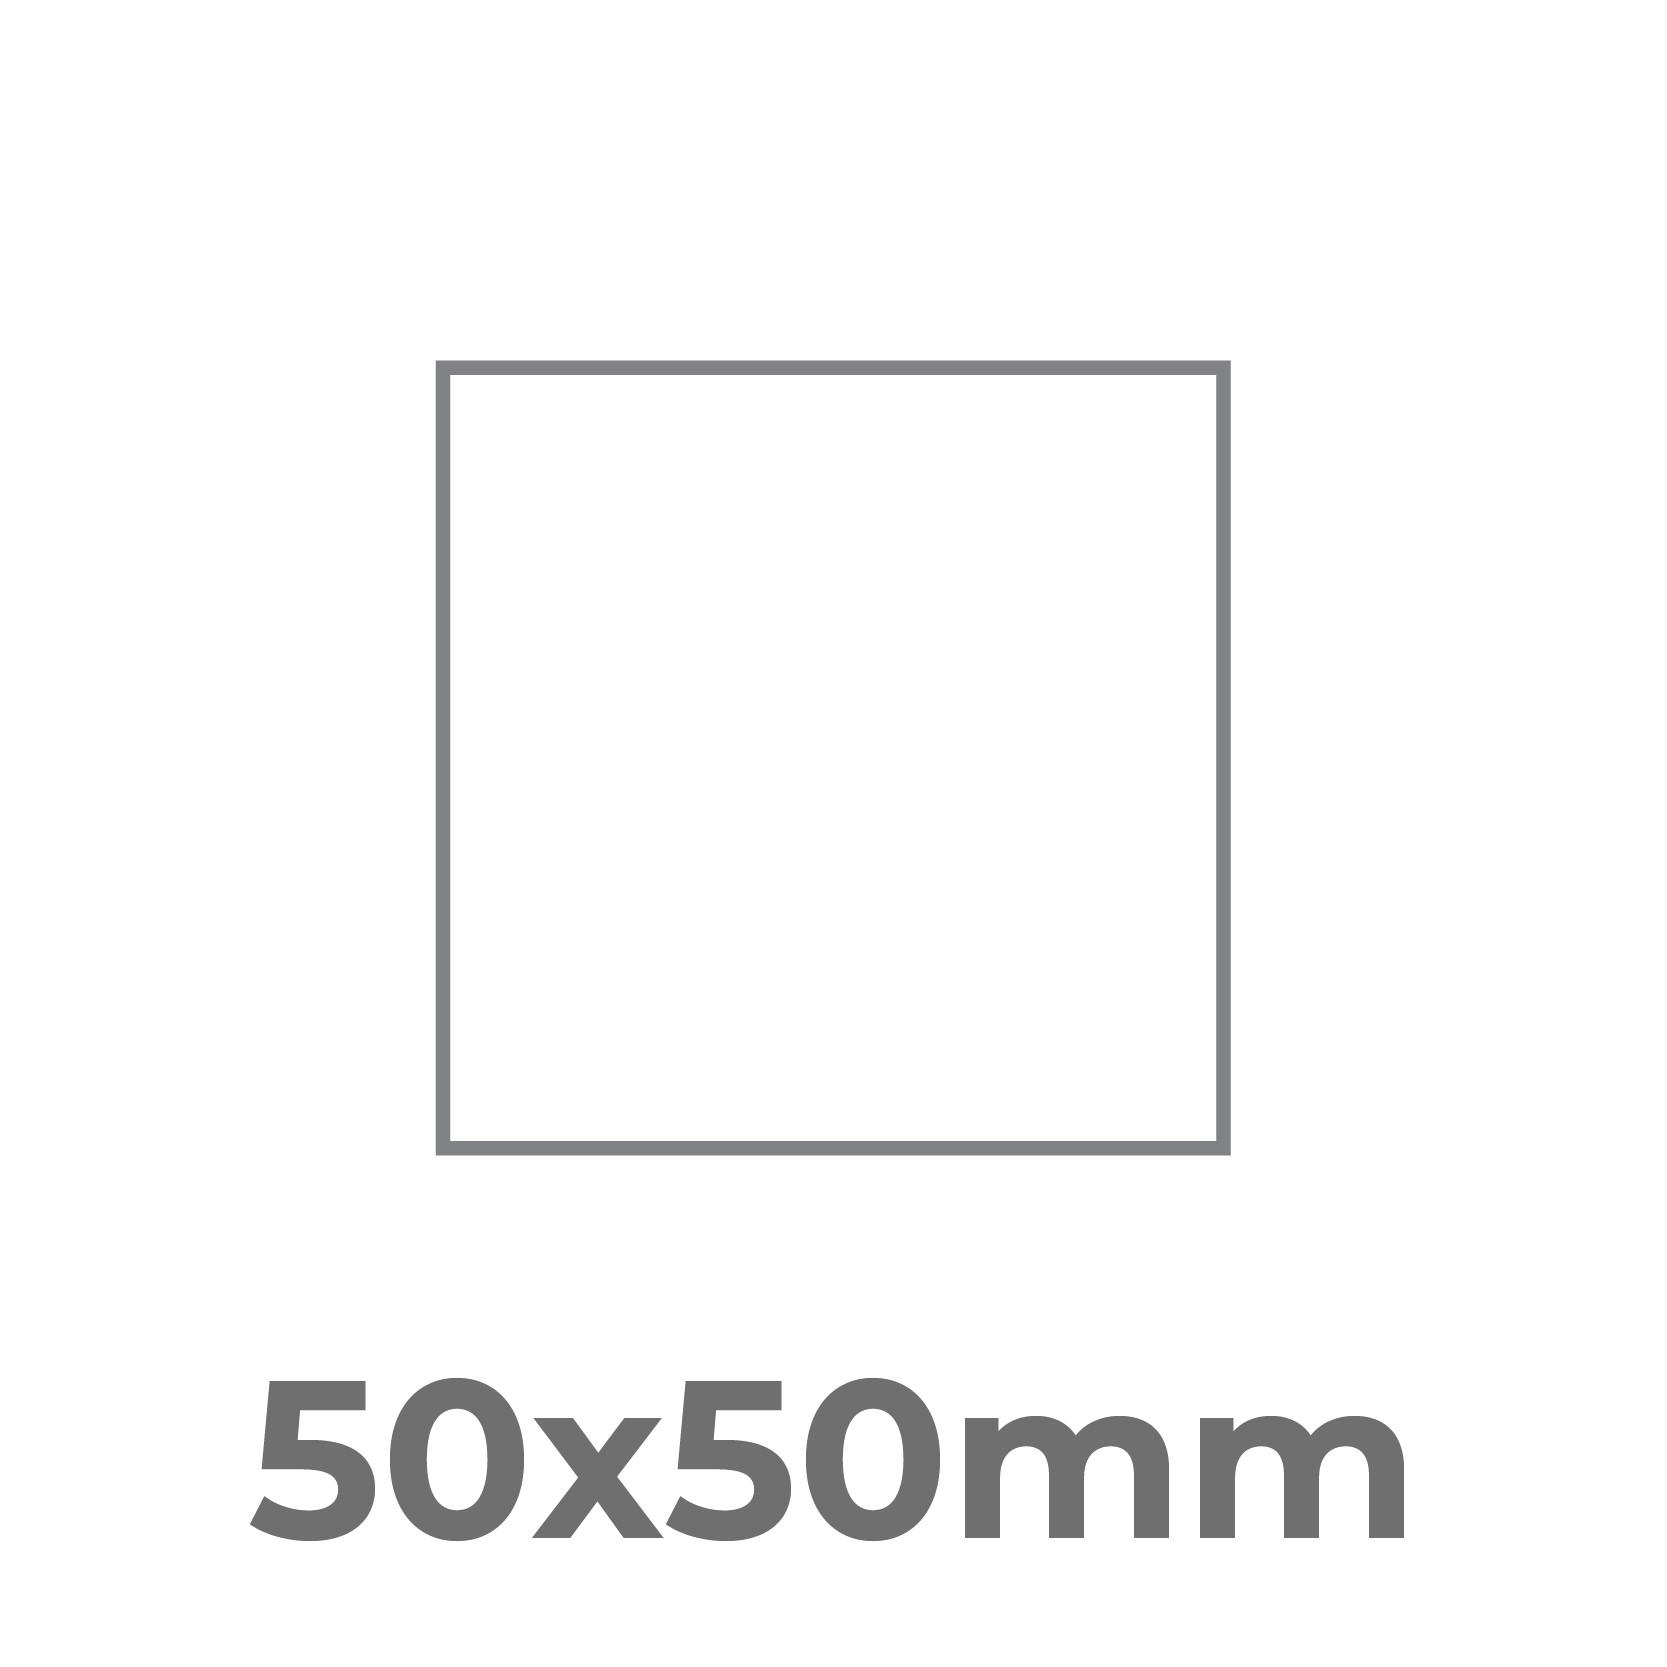 50x50 mm.